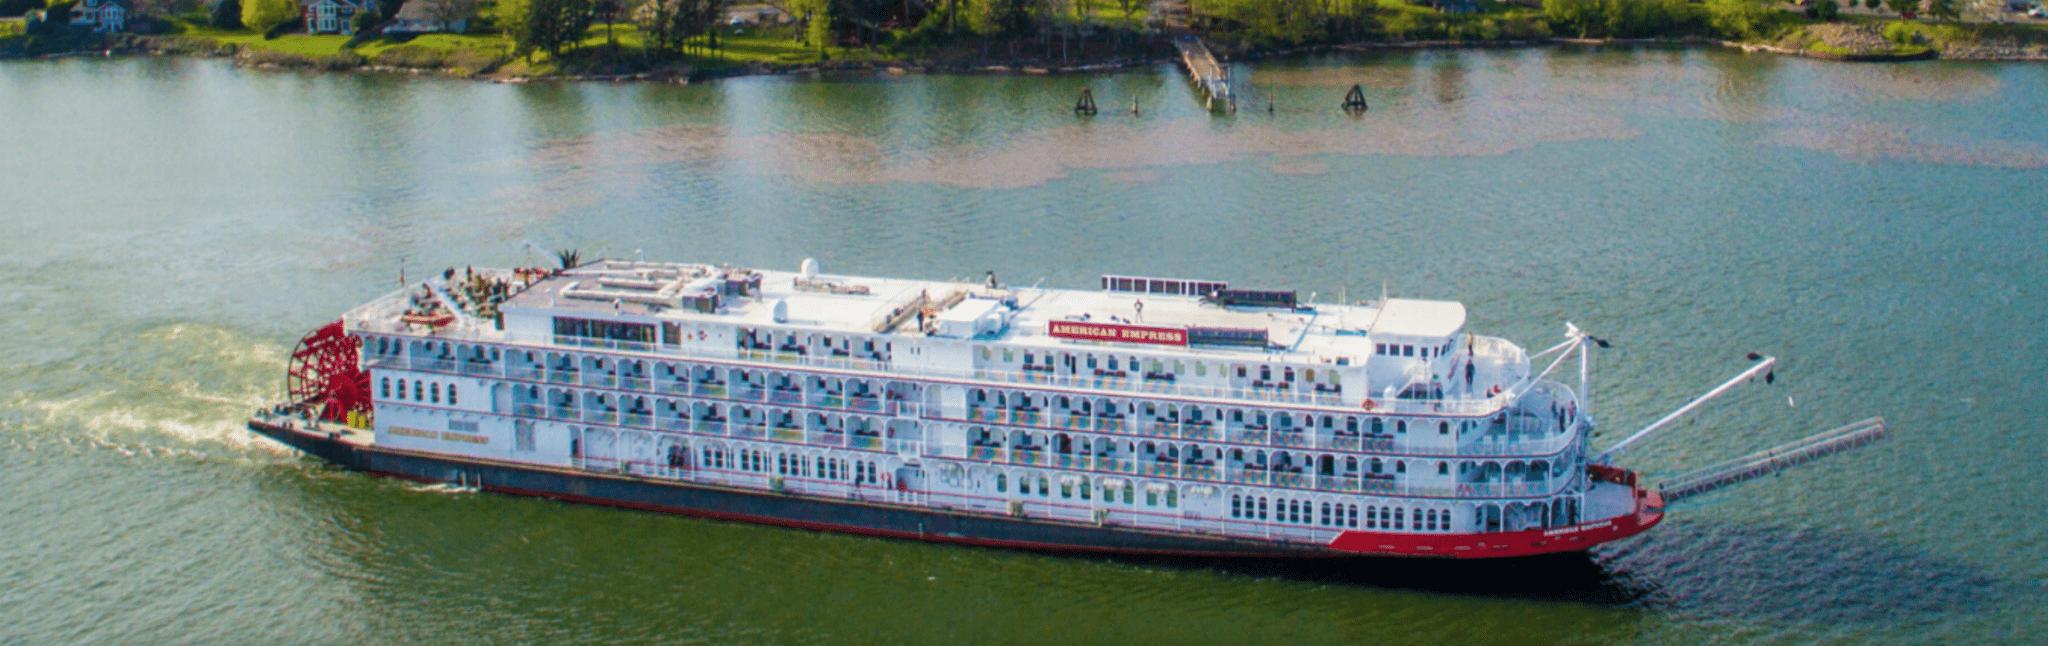 american empress american queen steamboat company